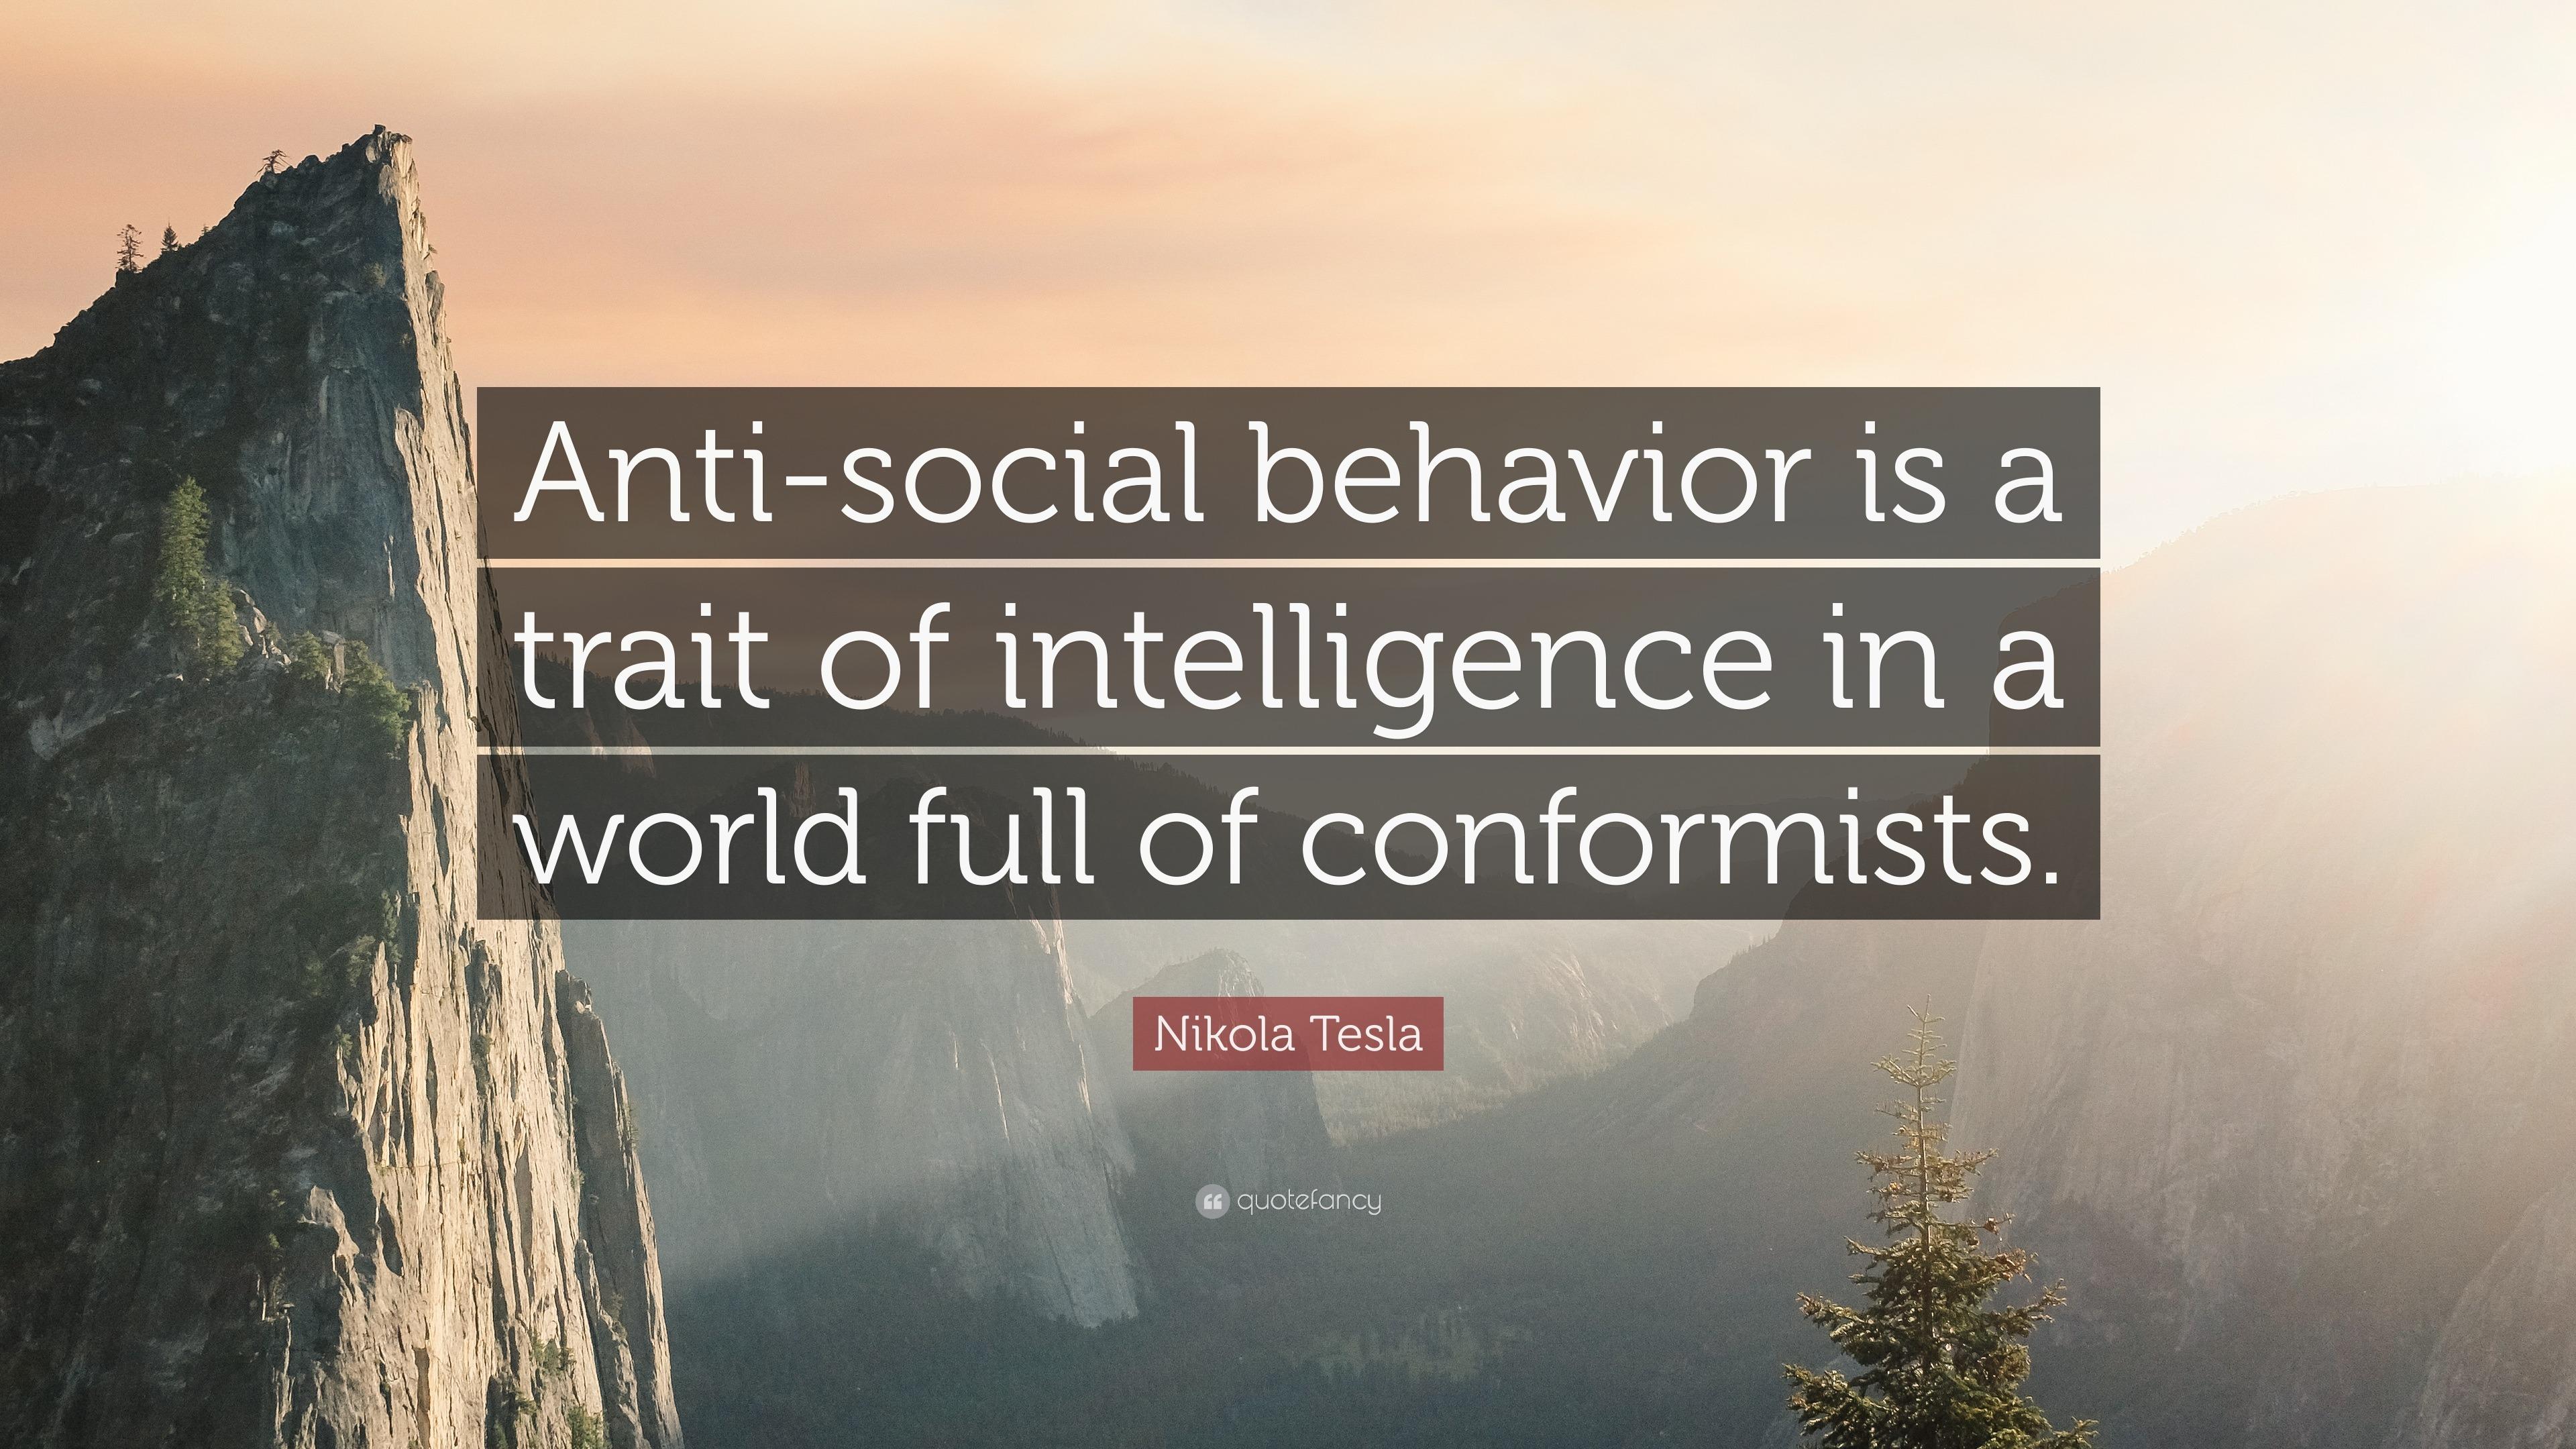 Eleanor Roosevelt Quote Wallpaper Nikola Tesla Quote Anti Social Behavior Is A Trait Of